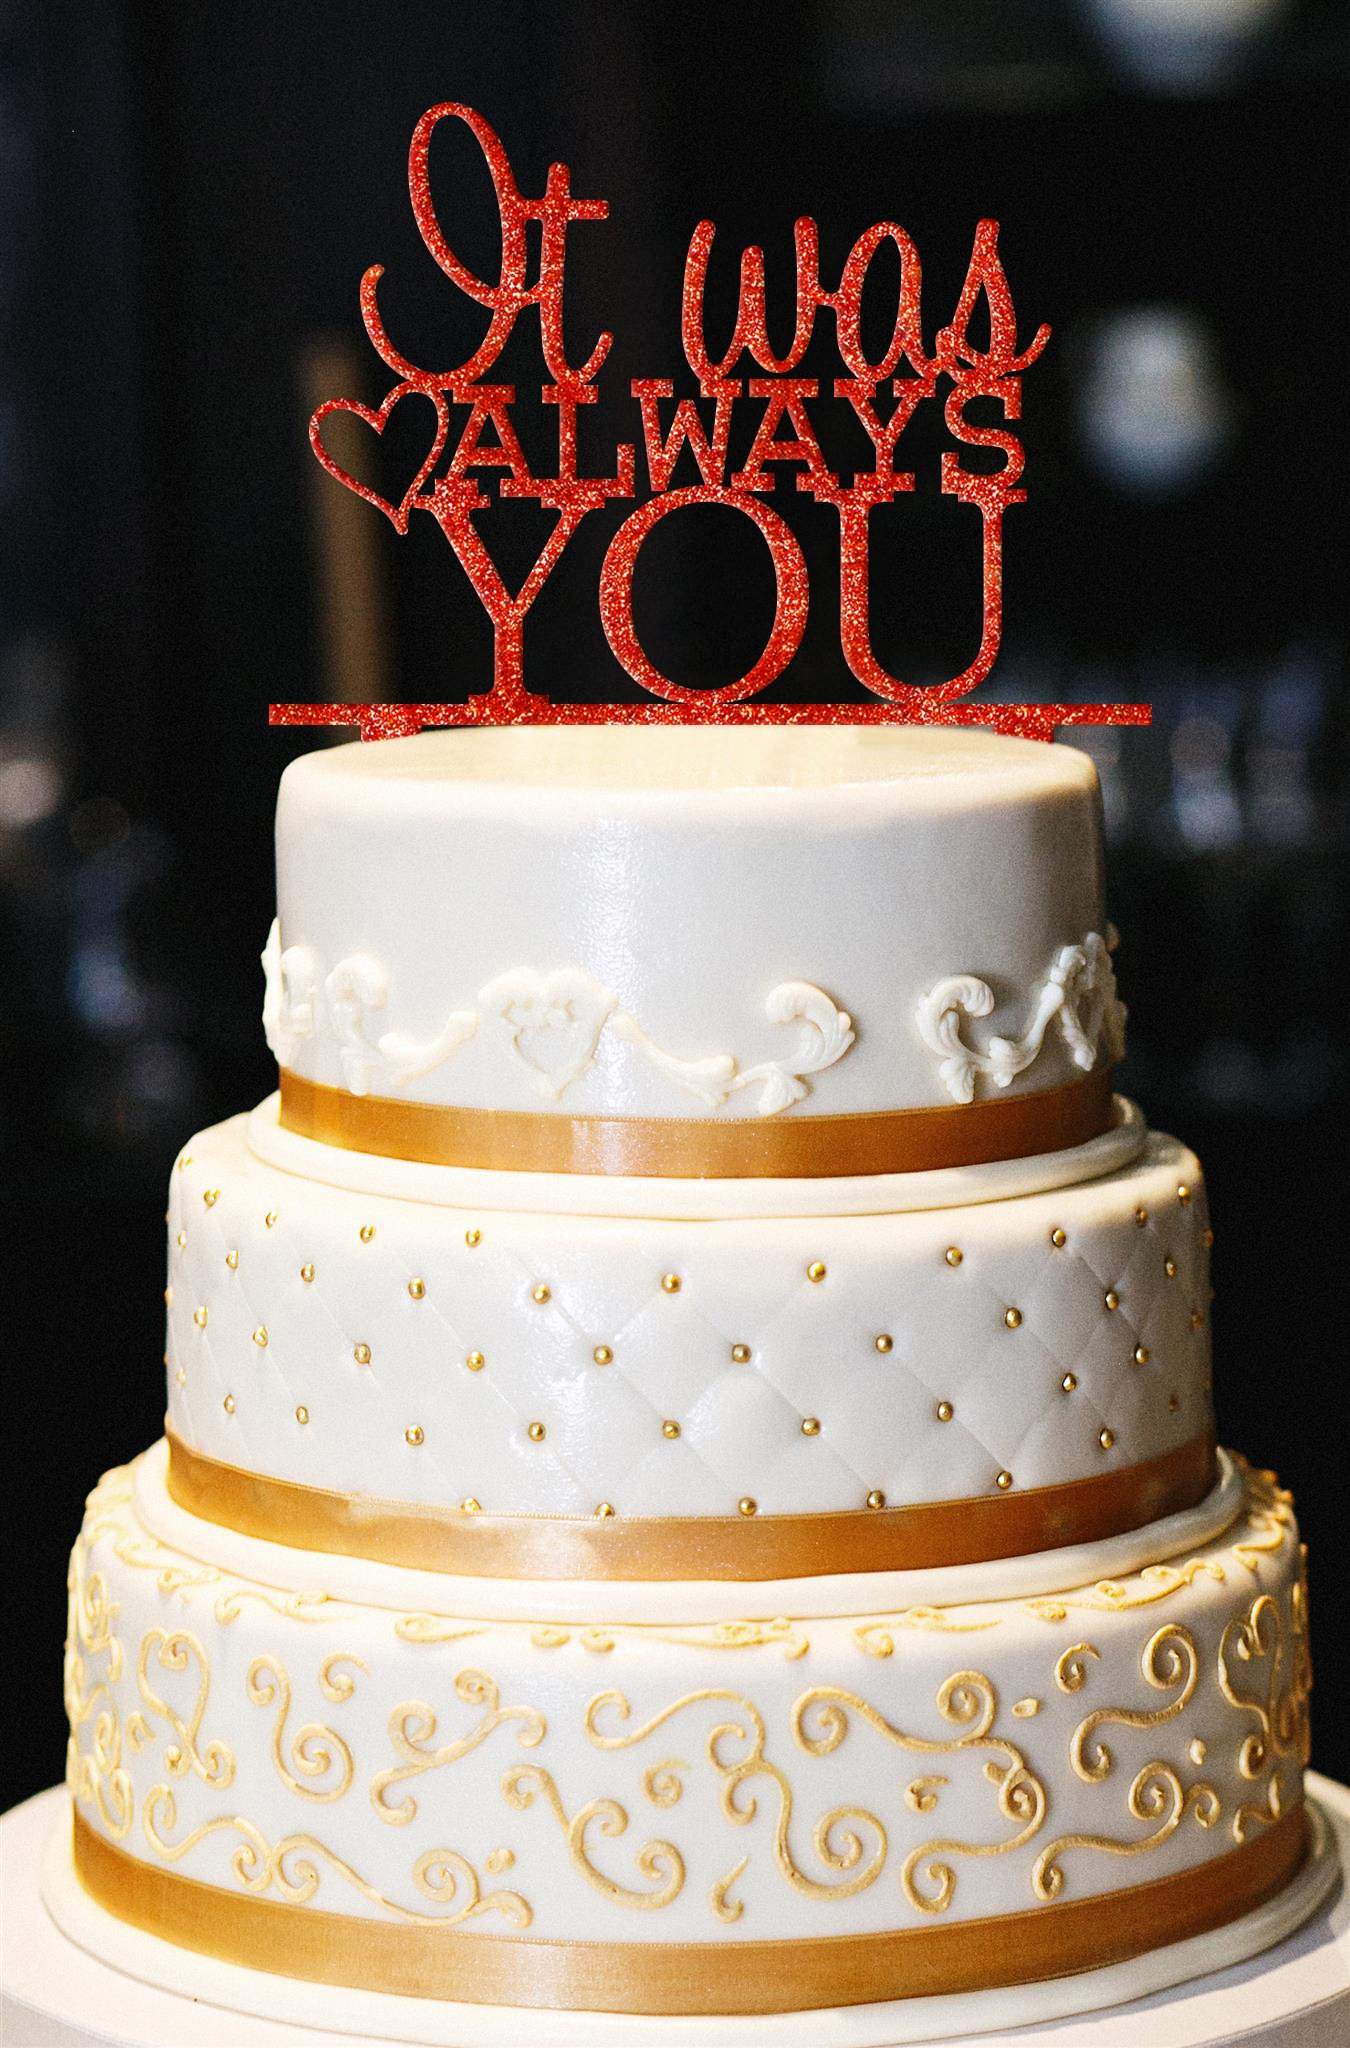 It Was Always You w/ Heart Wedding Cake Topper, Glitter Wedding Cake Topper, Engagement Cake Topper, Gold Cake Topper, Gold Glitter Topper (14'', Glitter Orange)